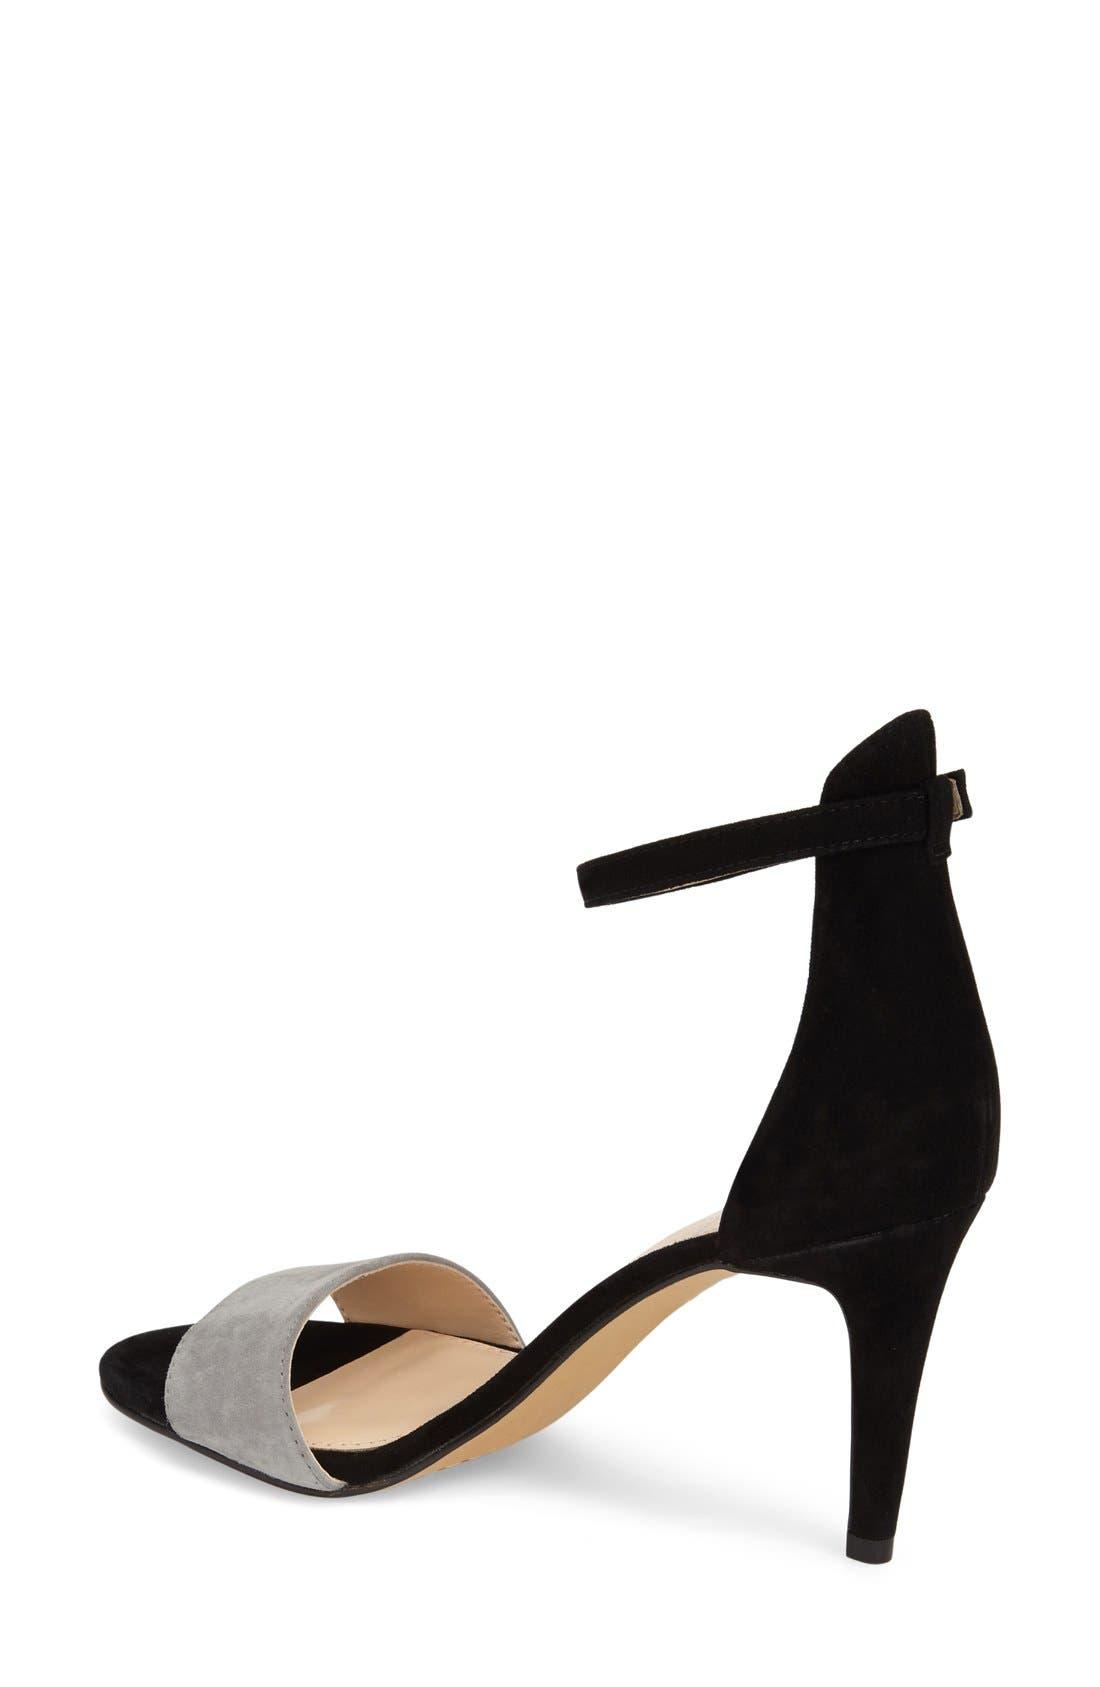 ,                             'Court' Ankle Strap Sandal,                             Alternate thumbnail 42, color,                             050